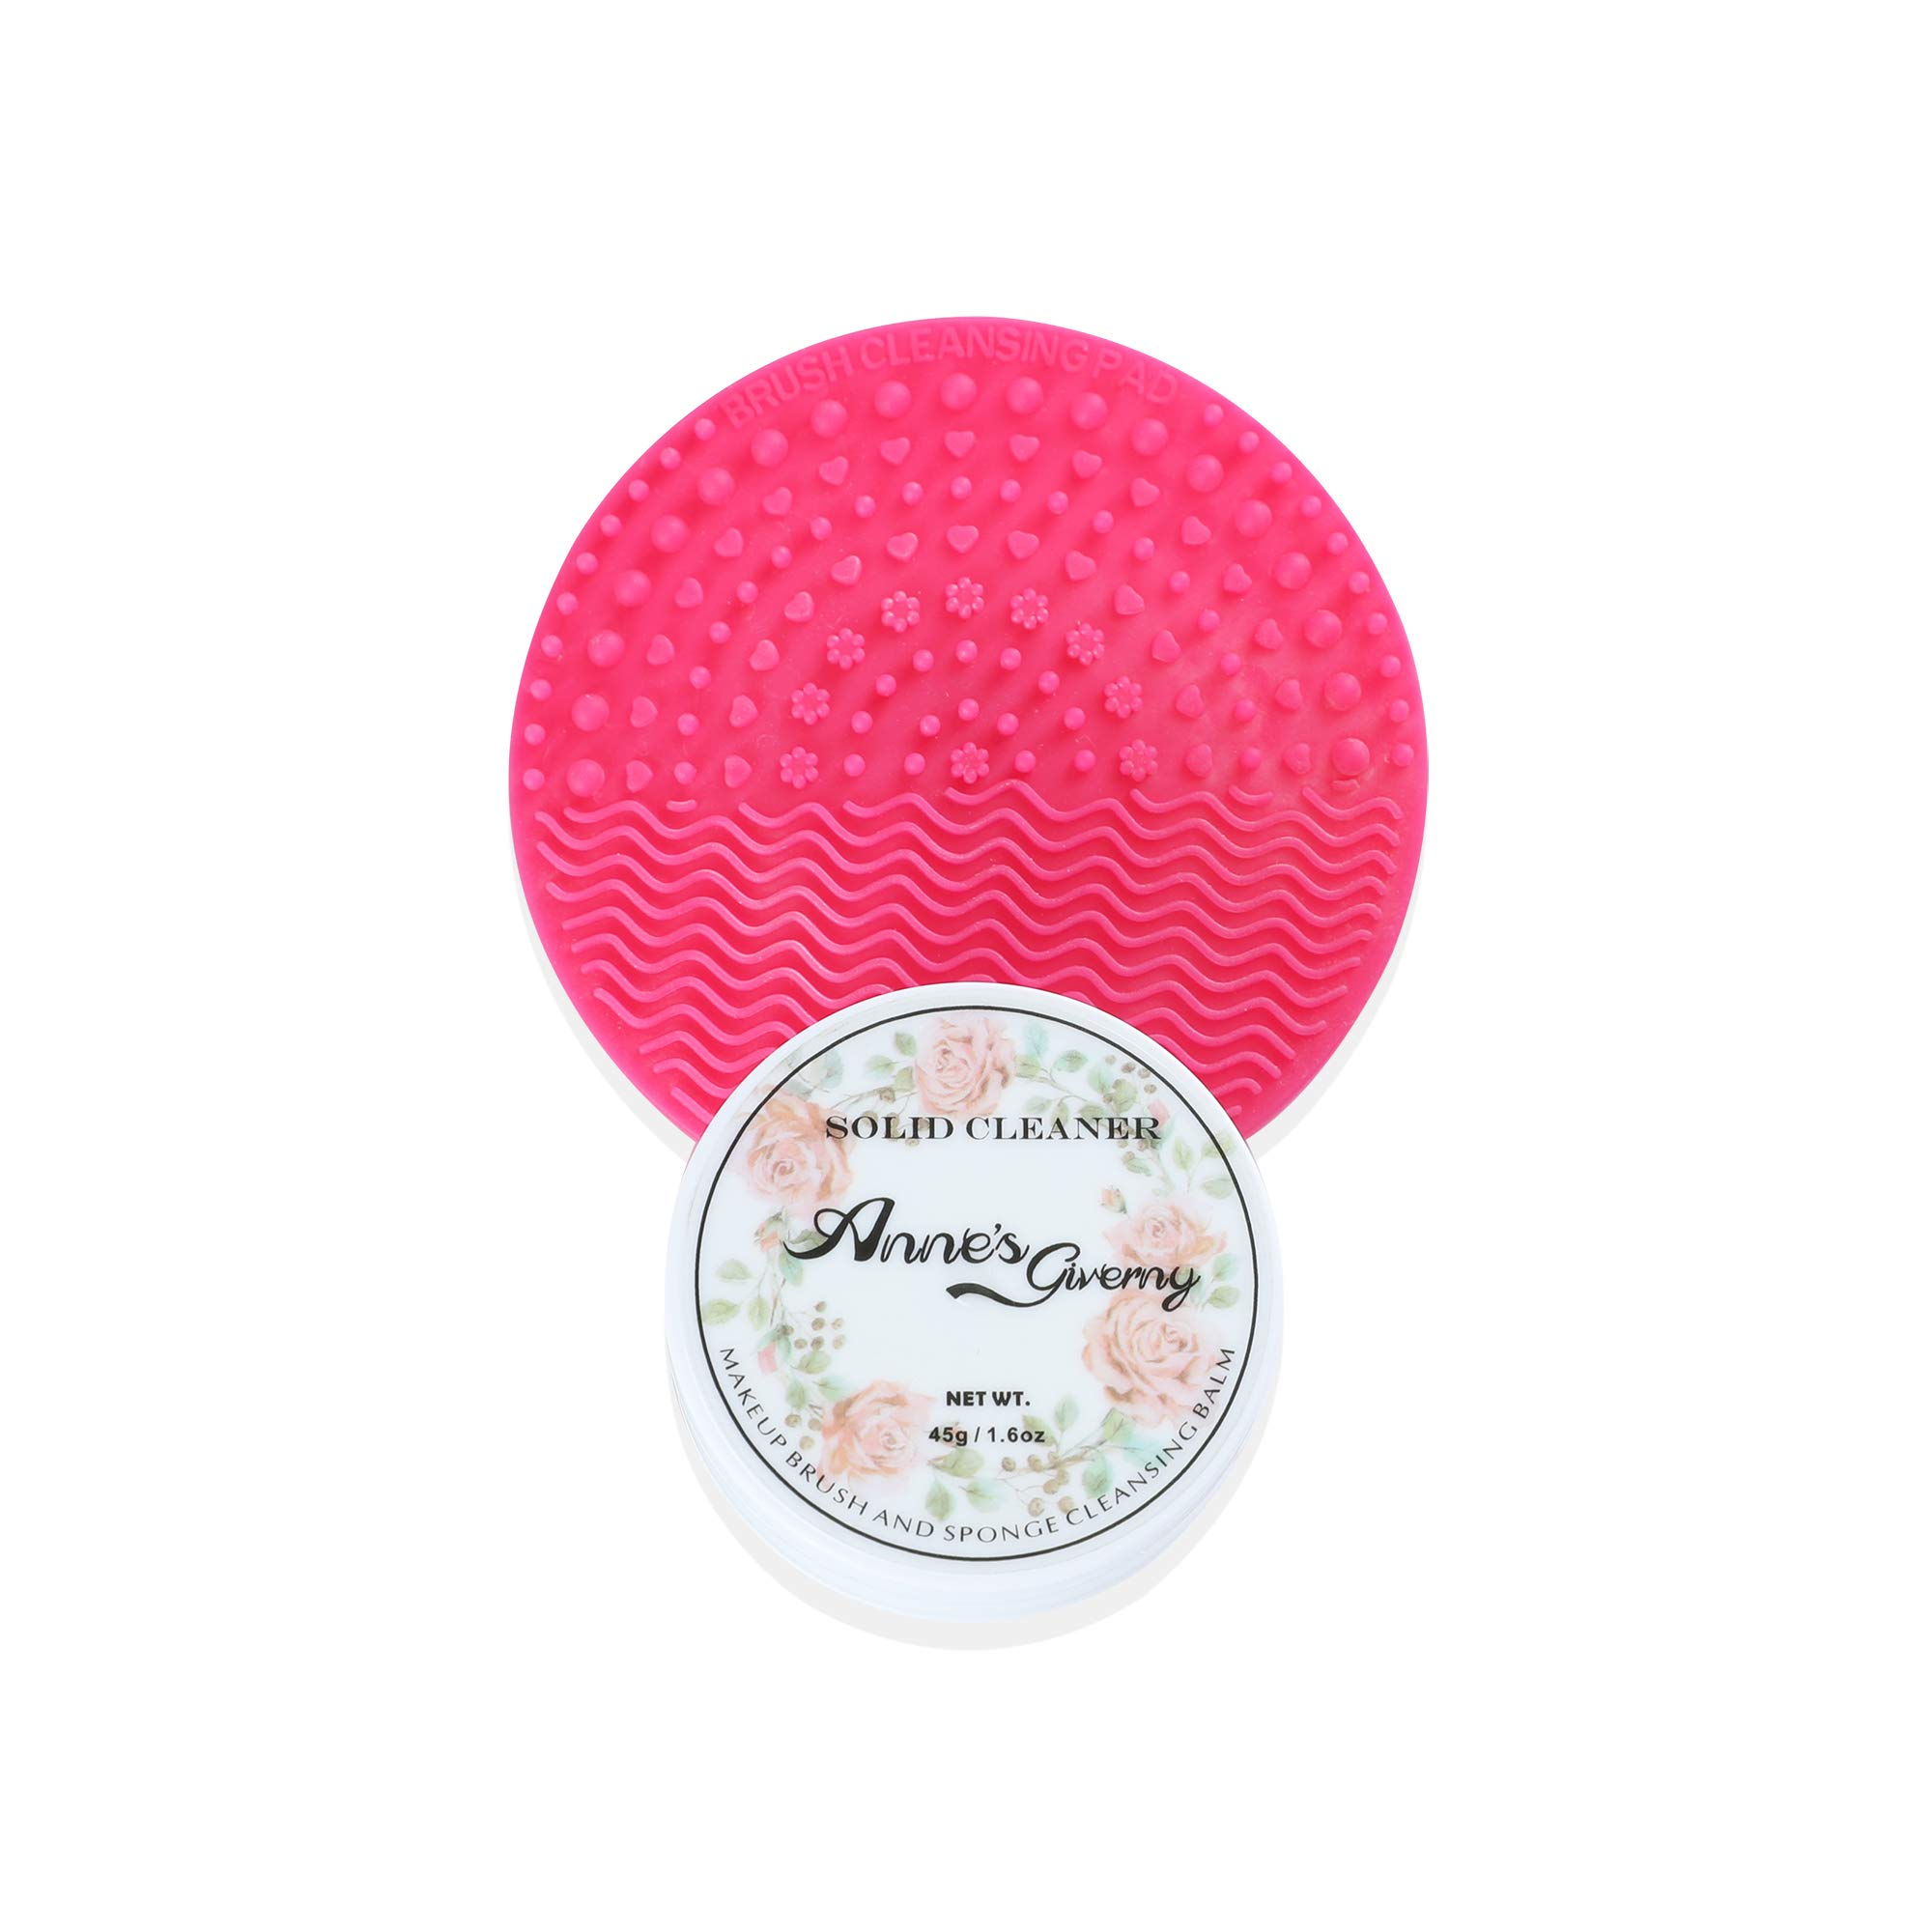 Anne's Giverny Makeup Brush Solid Cleaner Sponge Blender Cleanser (Cleaner+Pad)